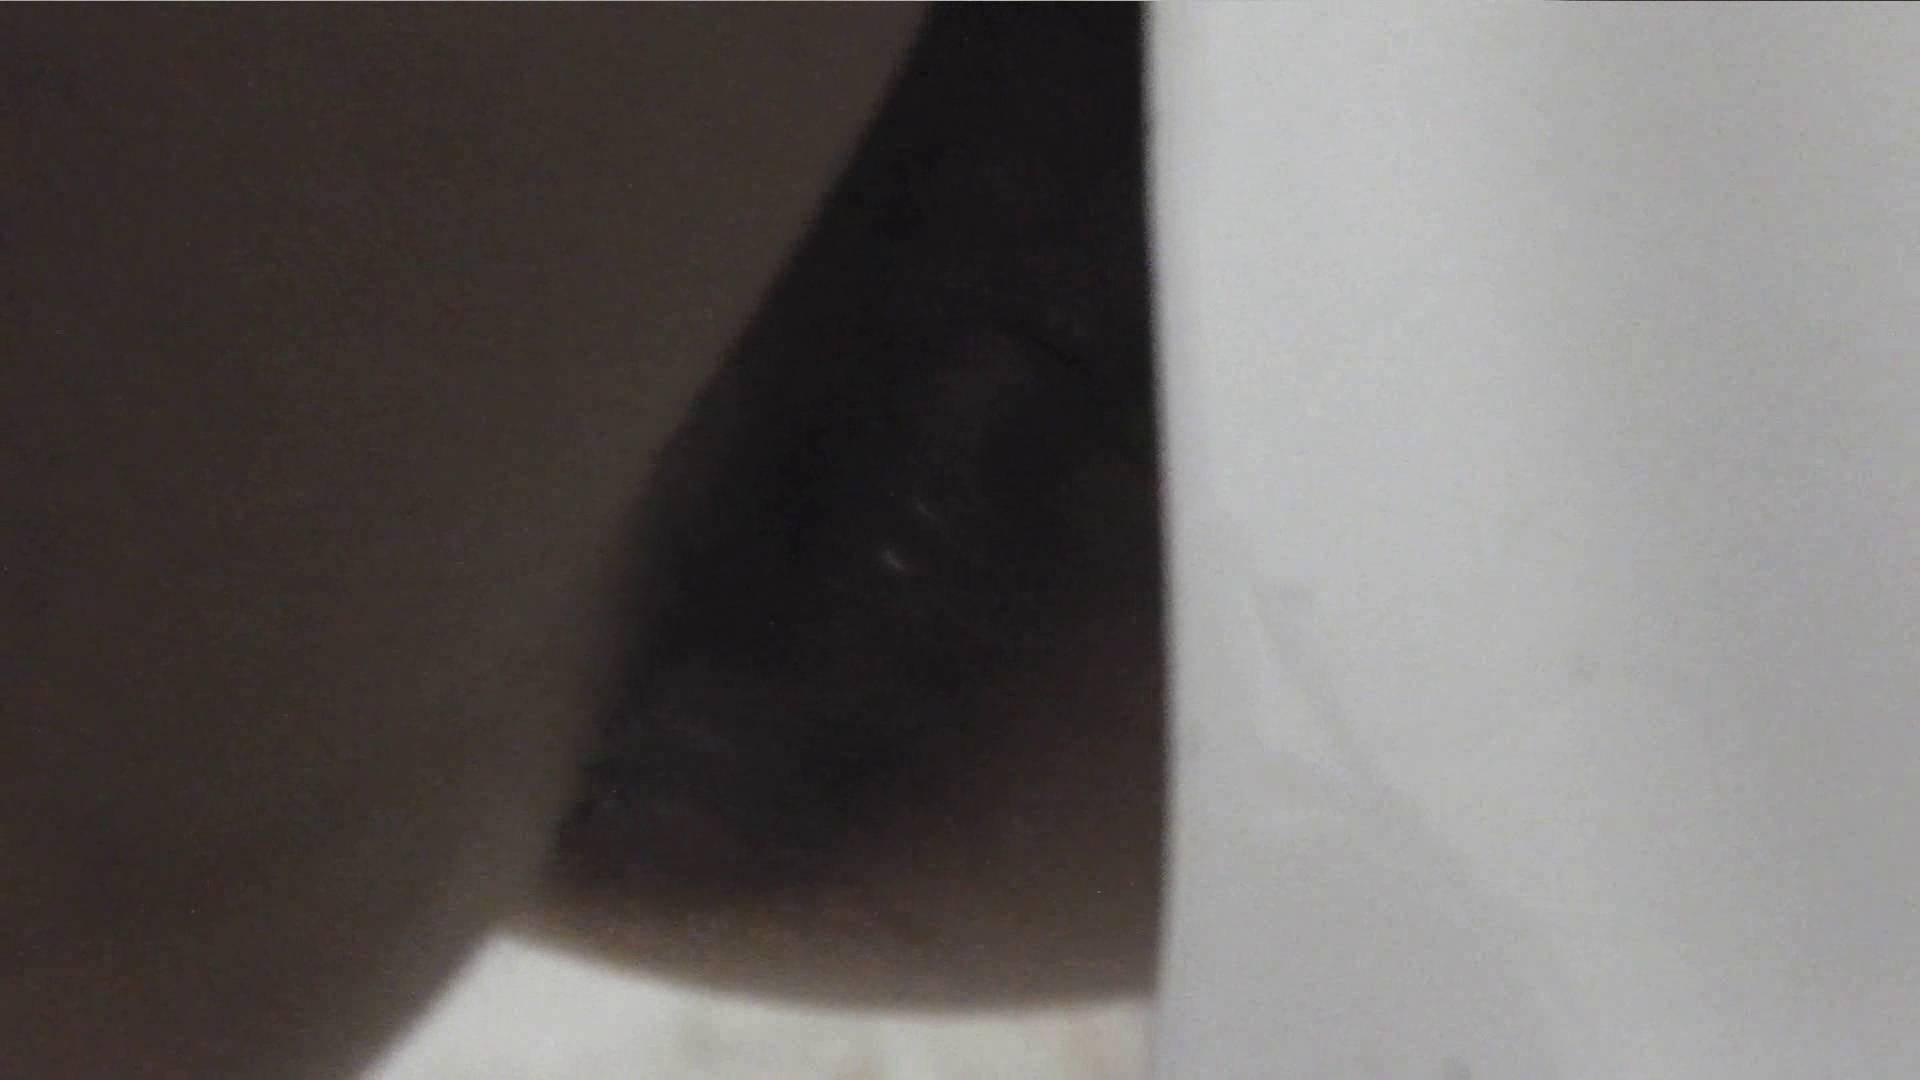 洗面所特攻隊 vol.001 清楚な美脚さん 洗面所 性交動画流出 89連発 23